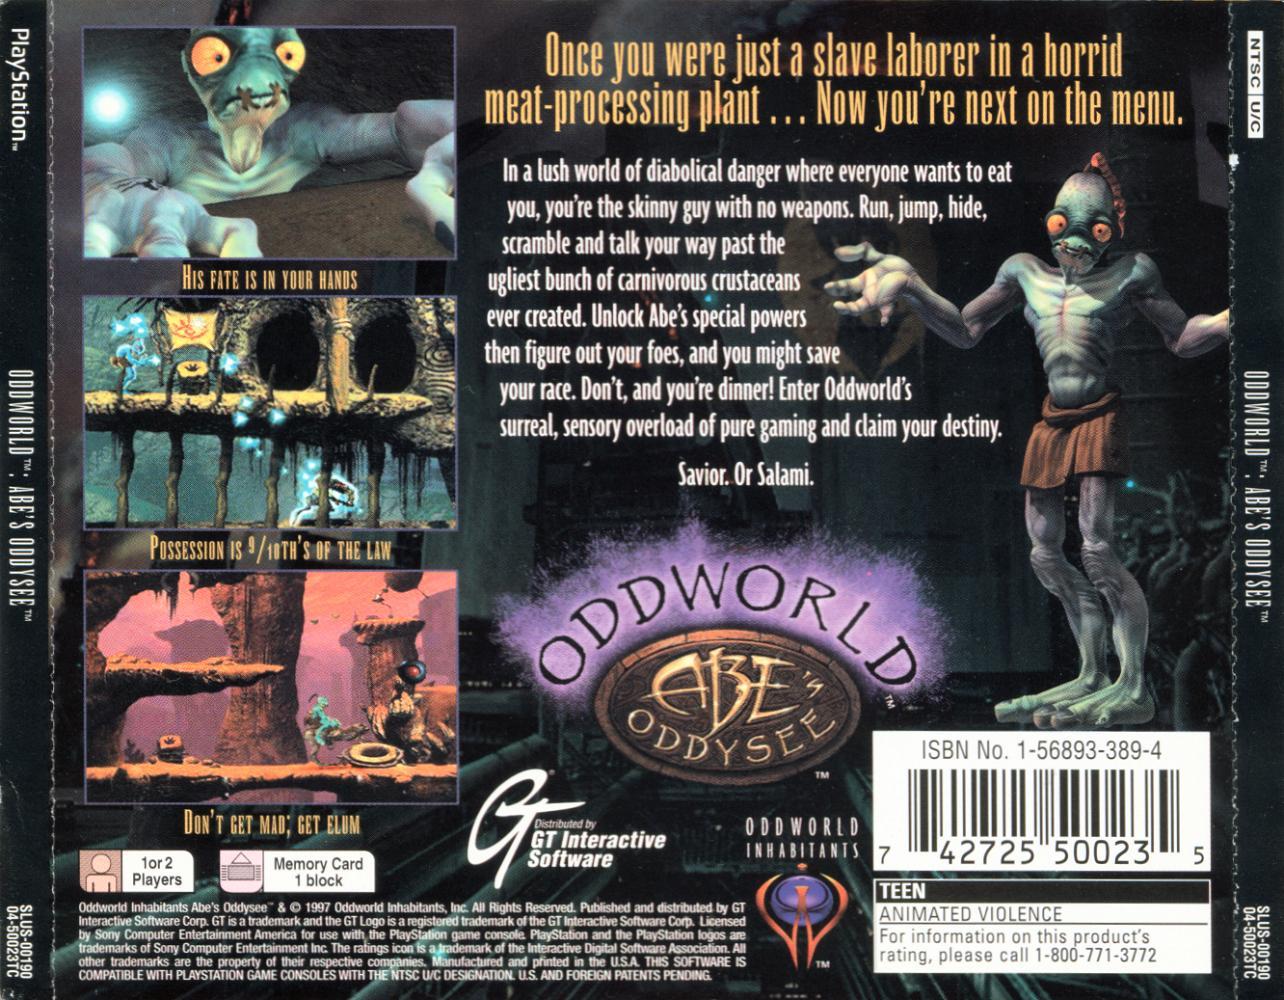 ReBoot Retro (Část 1) : Oddworld Abe's Oddysee 7571